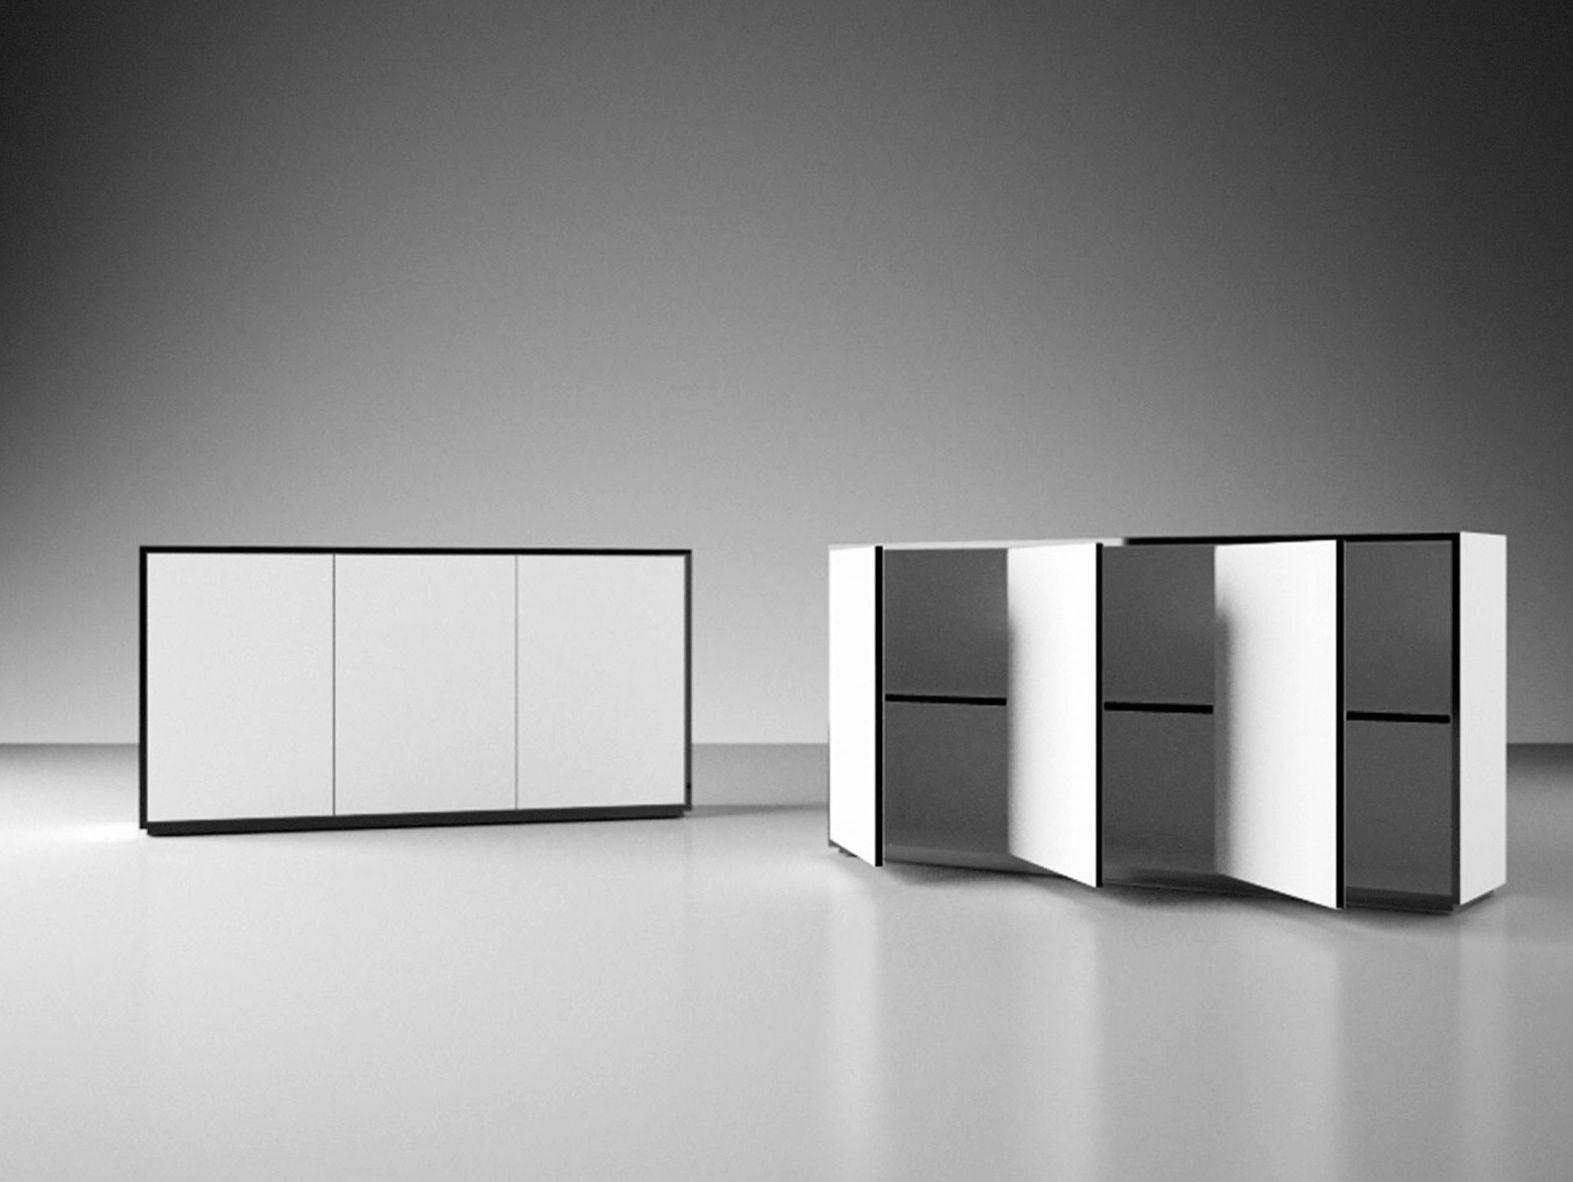 Auxilium mobile ufficio by rechteck felix schwake design for Mobile ufficio basso